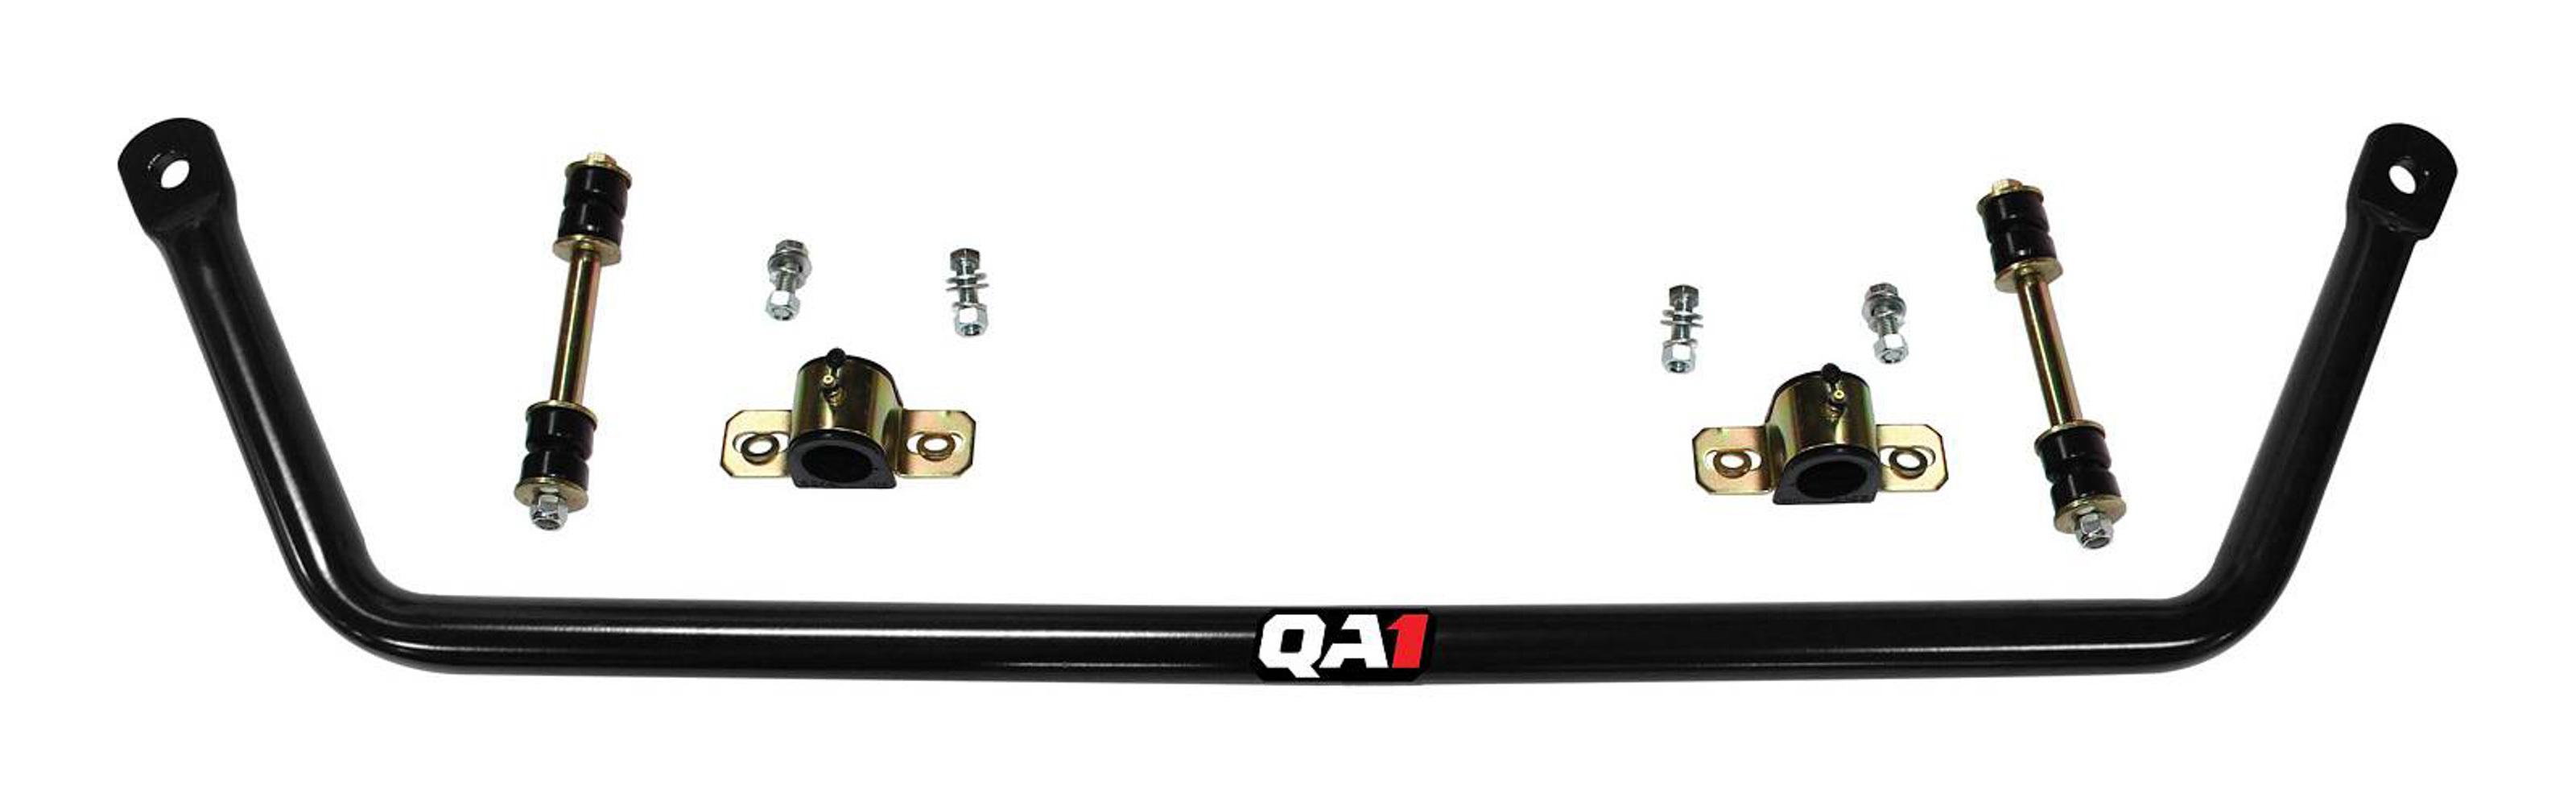 Qa1 Sway Bar - Front 1-1/4in 66-72 Mopar B-Body